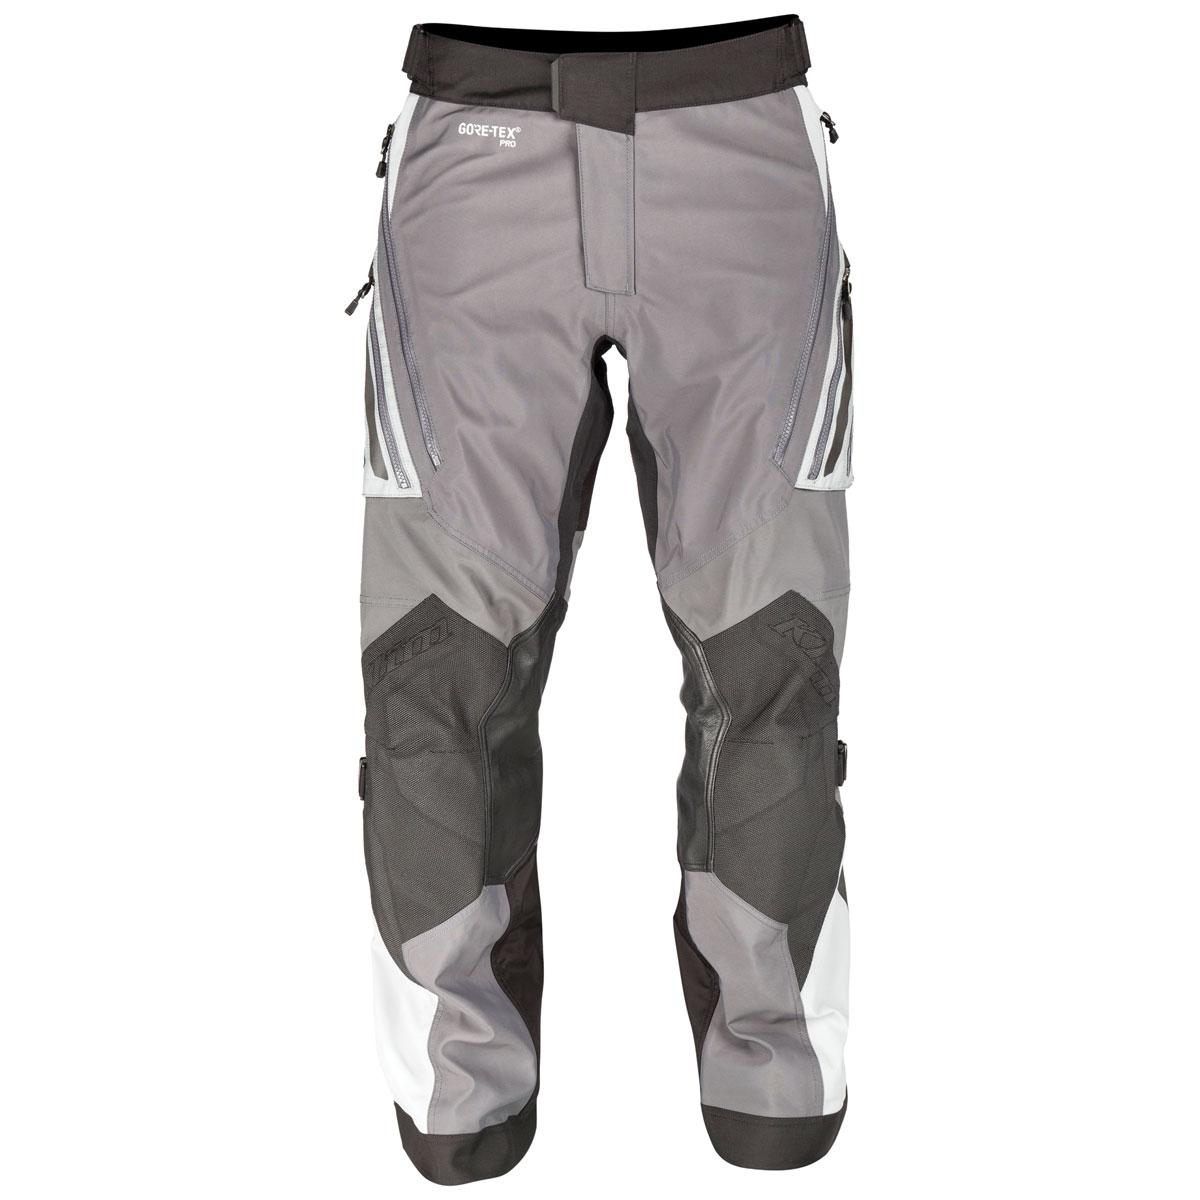 Klim Men's Badlands Pro Gray Pants